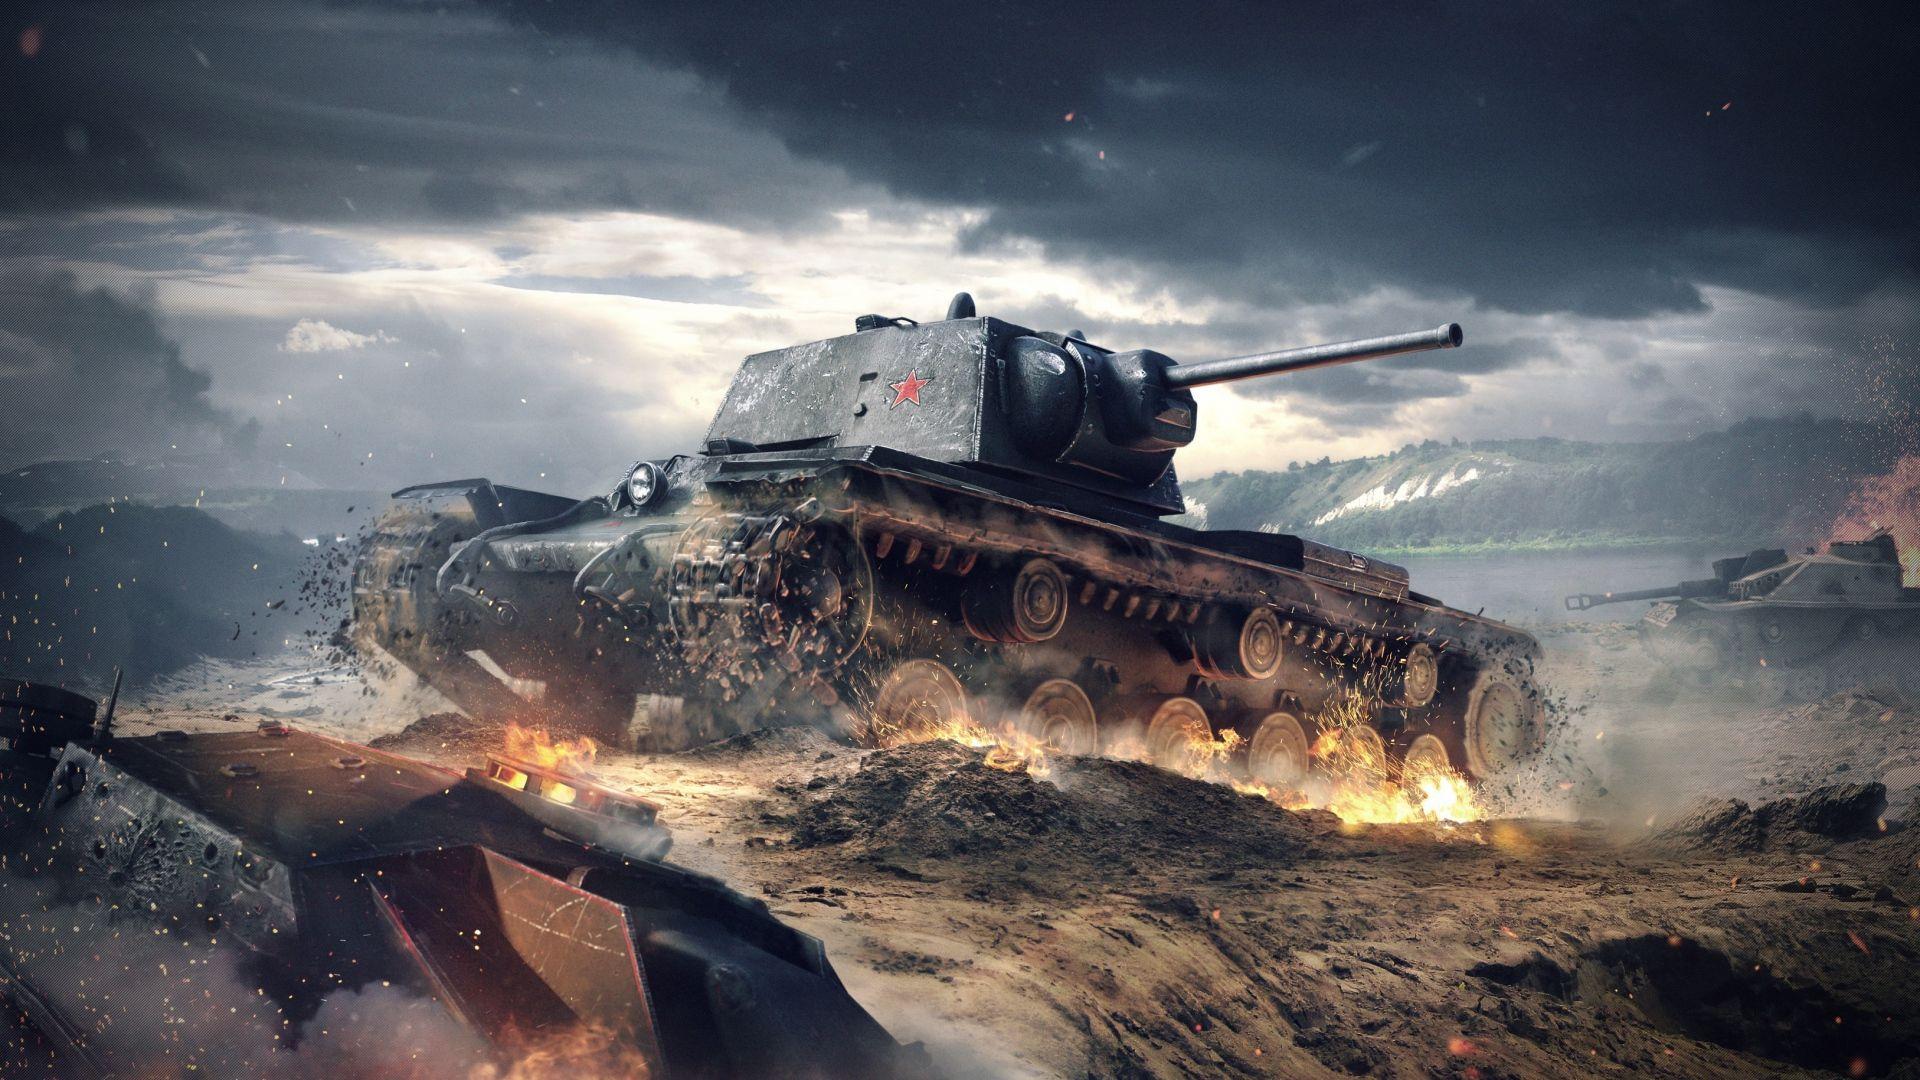 1920x1080 Wallpaper World Of Tanks Blitz Wargaming Net Kv